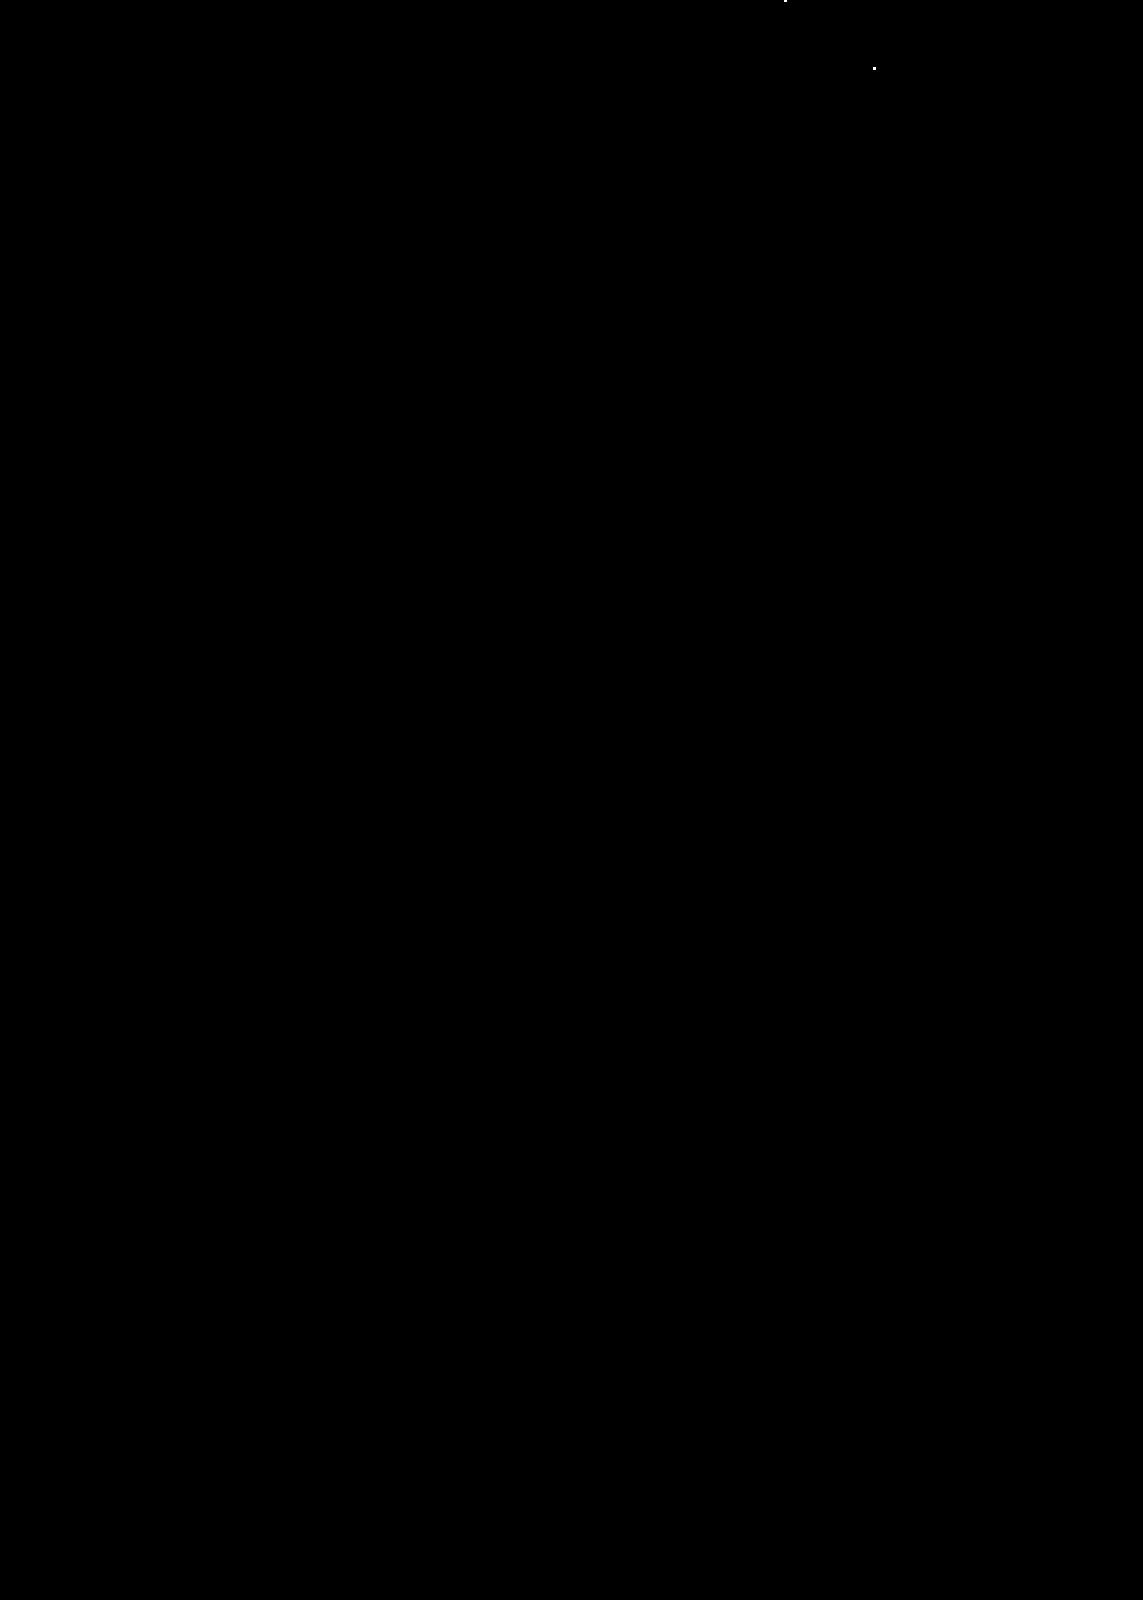 transparent black border - HD860×1243